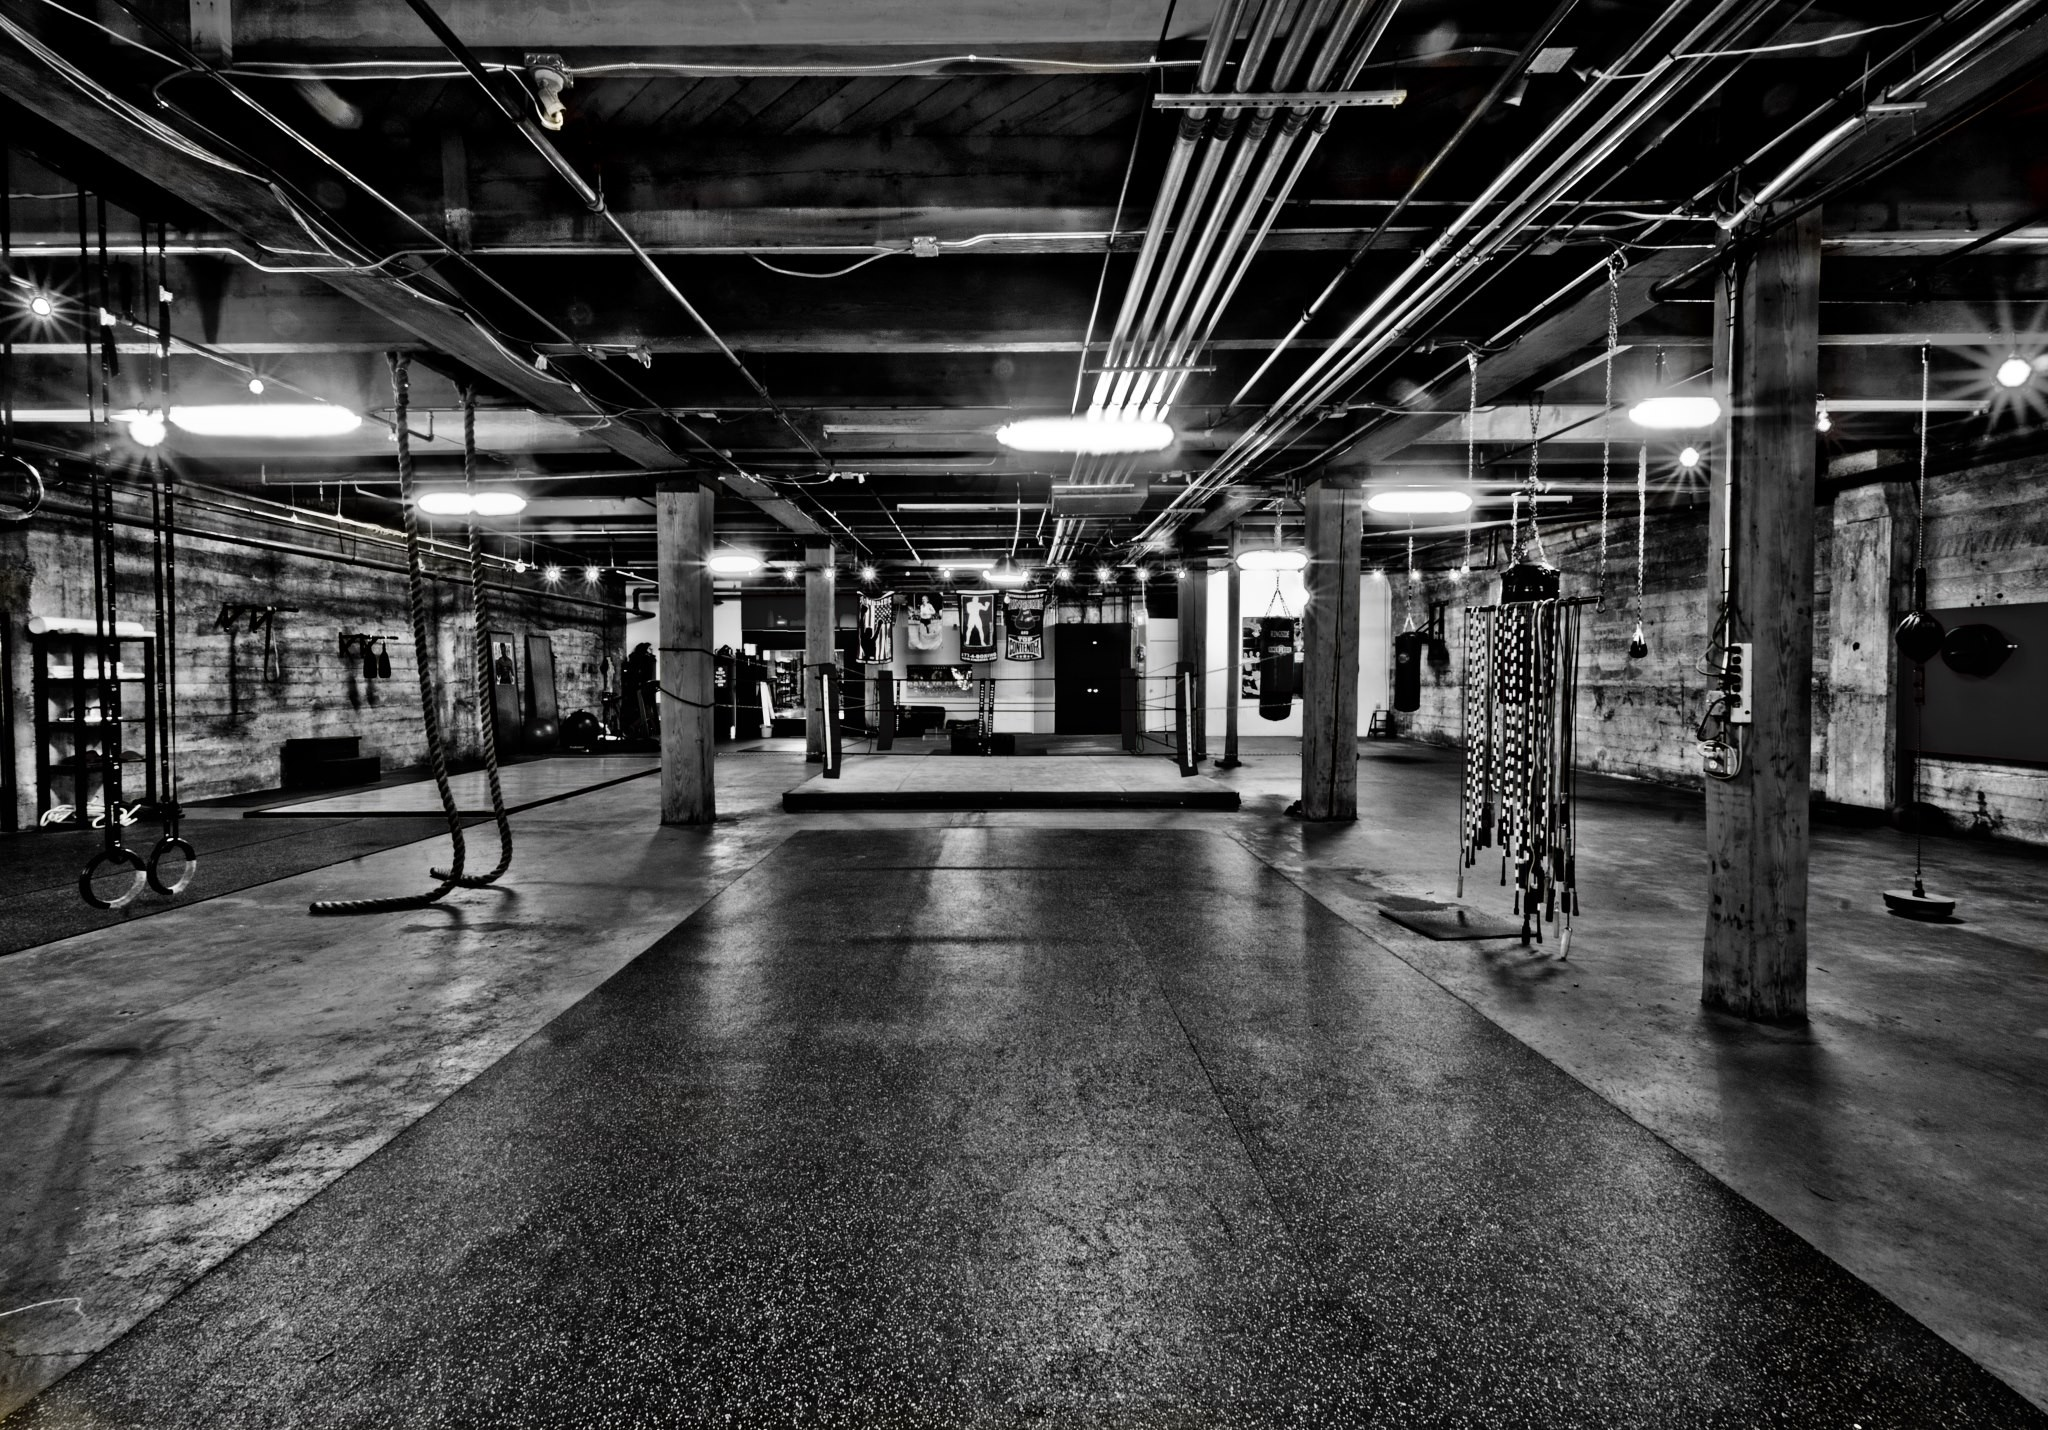 226671-top-gym-wallpaper-2048x1430.jpg